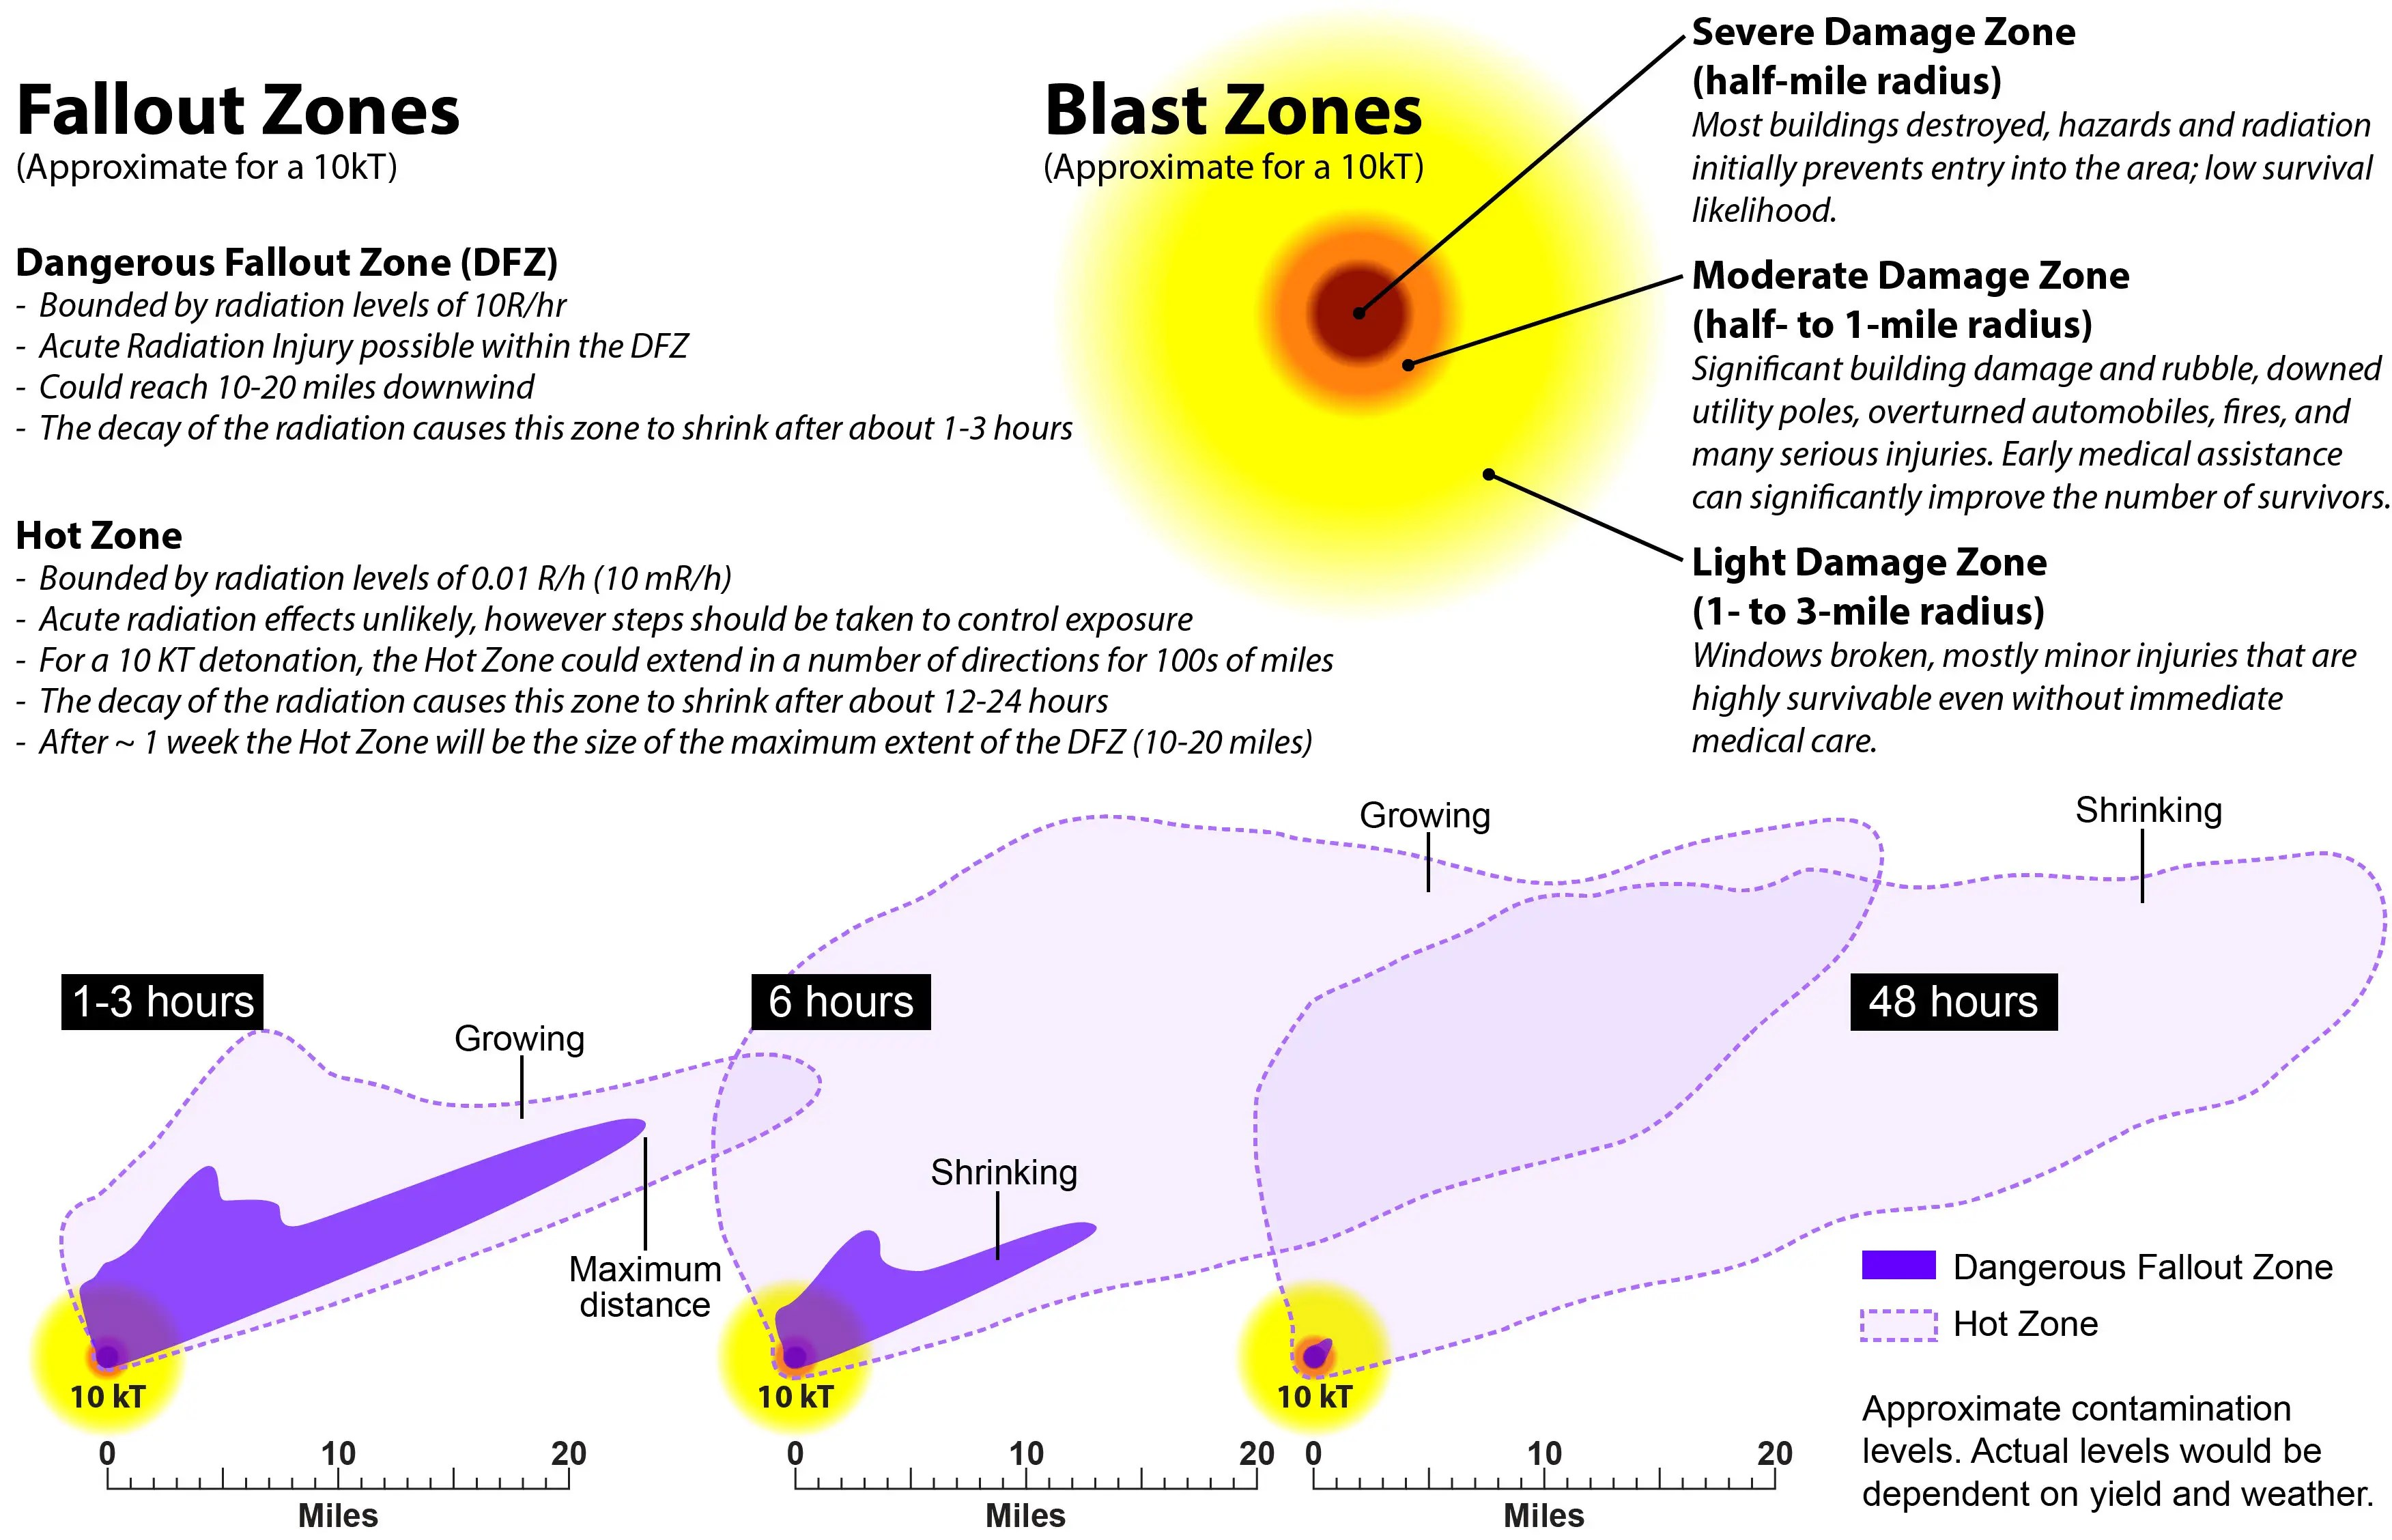 radioactive fallout zone nuclear blast expanding shrinking 48 hours bruce buddemeier llnl